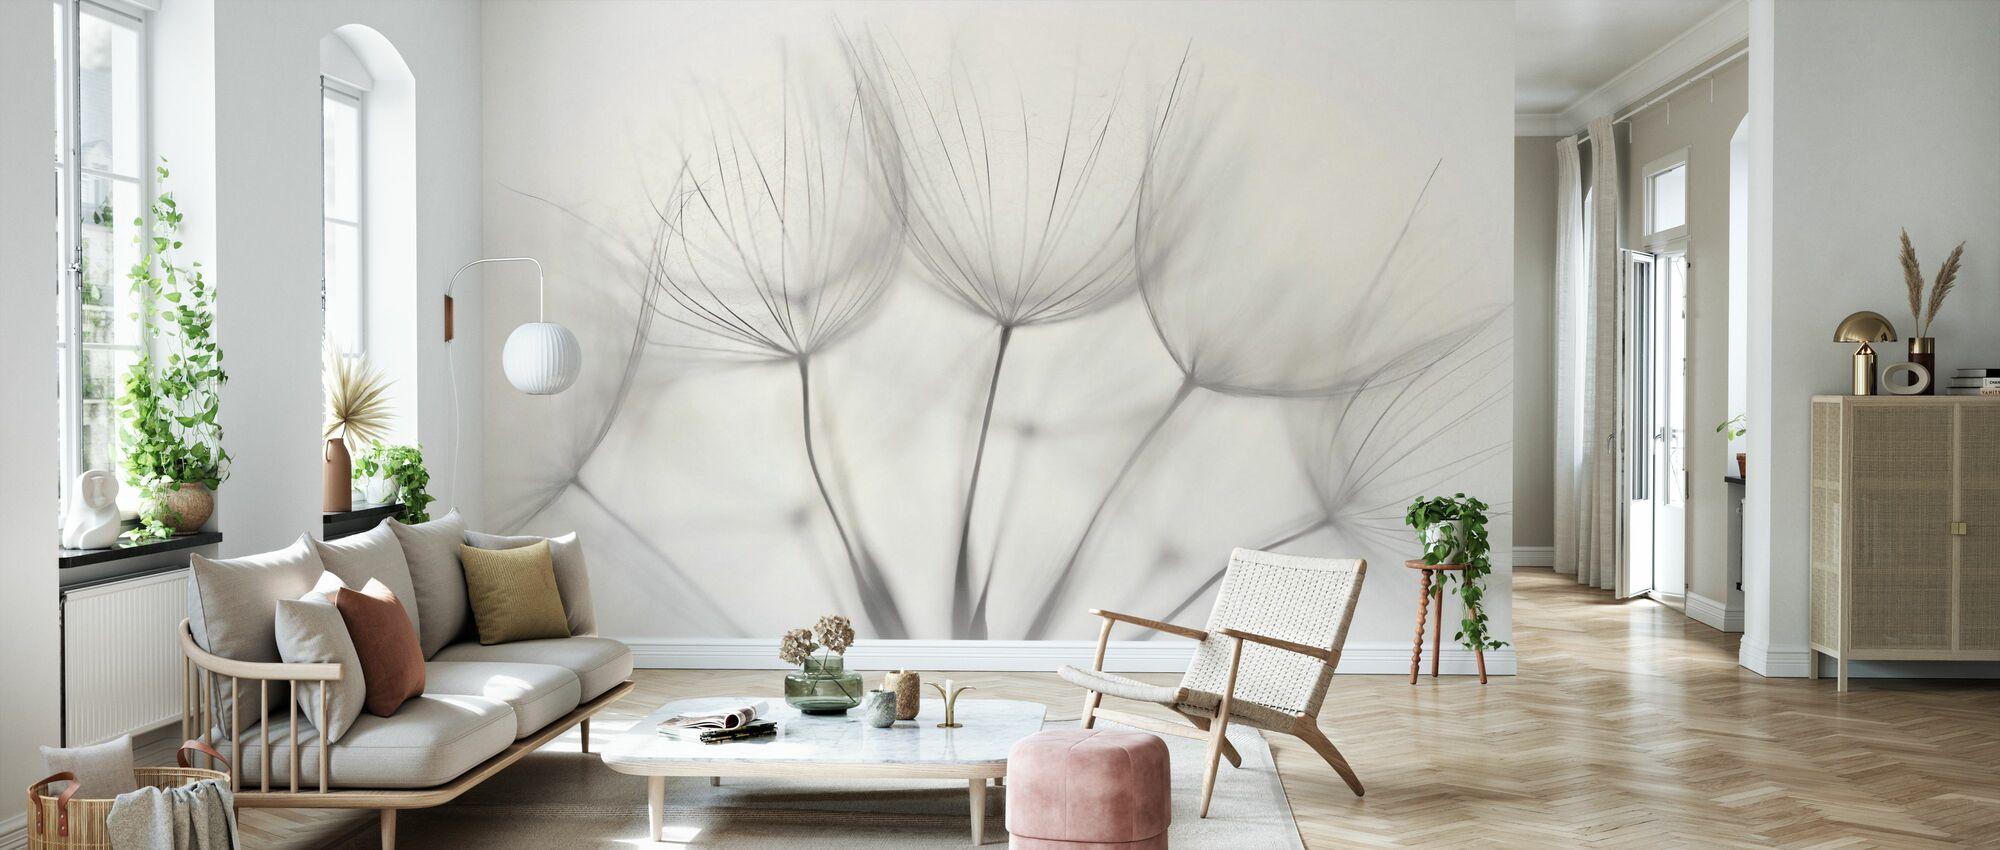 Delicate - Wallpaper - Living Room